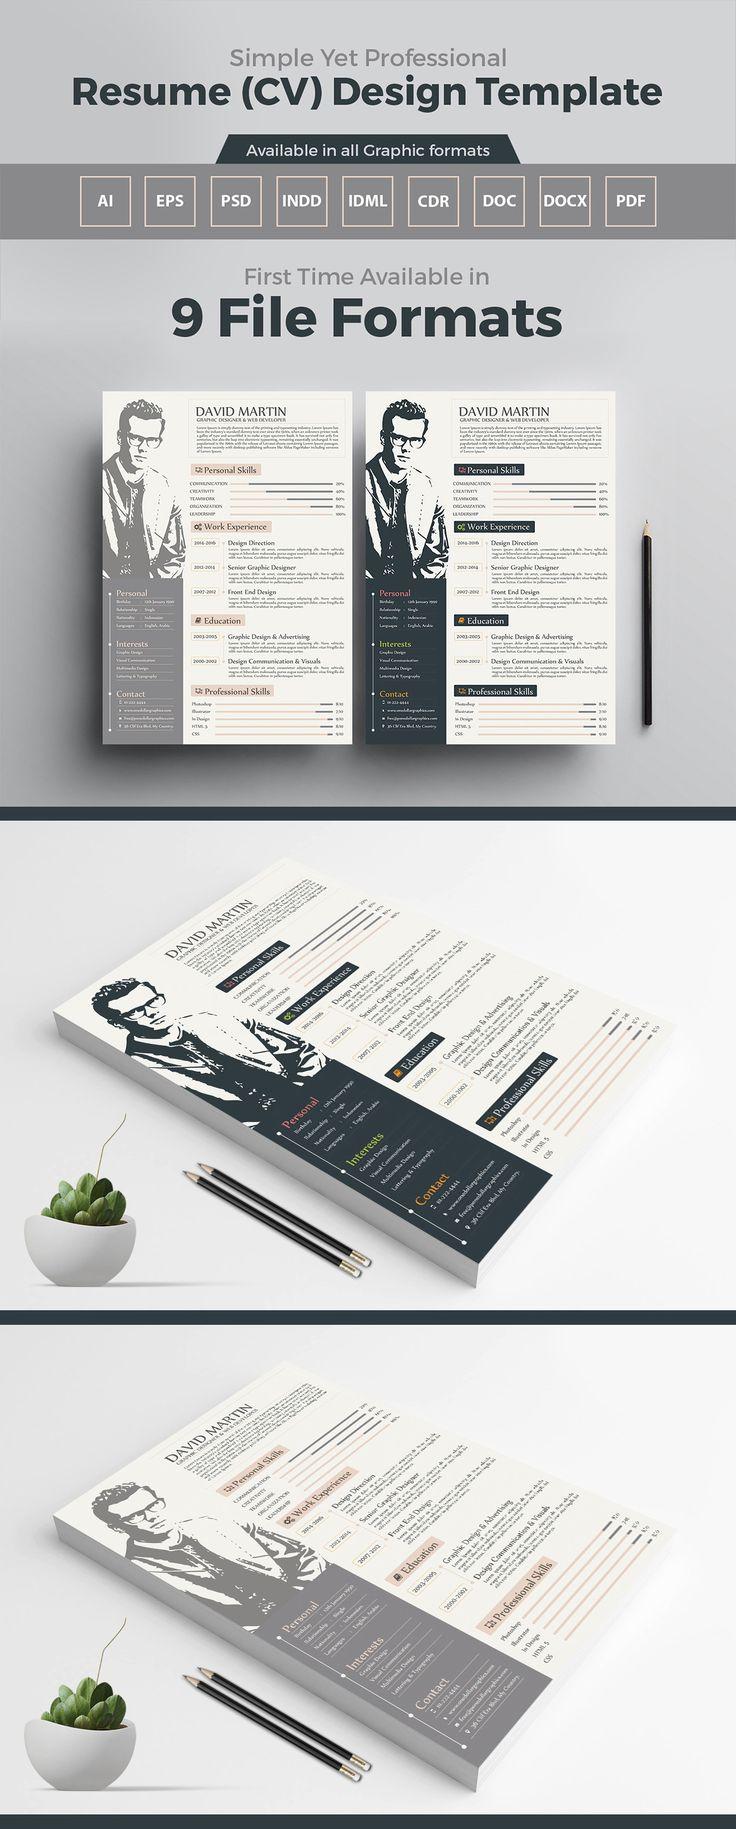 10 best Free & Premium Resume Design Templates images on Pinterest ...